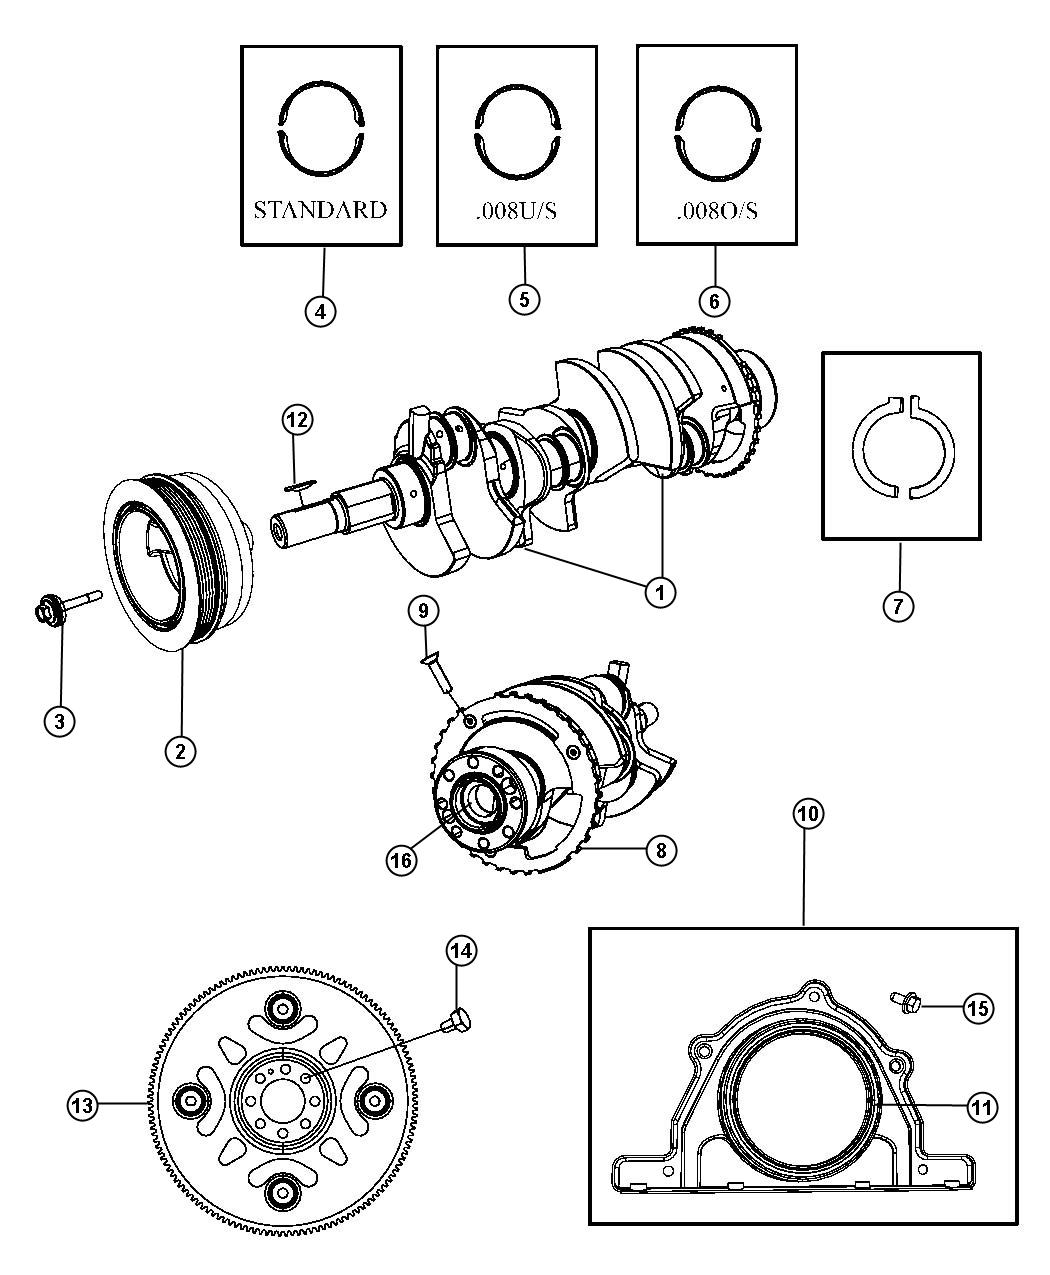 Chrysler 300 Crankshft Includes Tone Ring For Crank